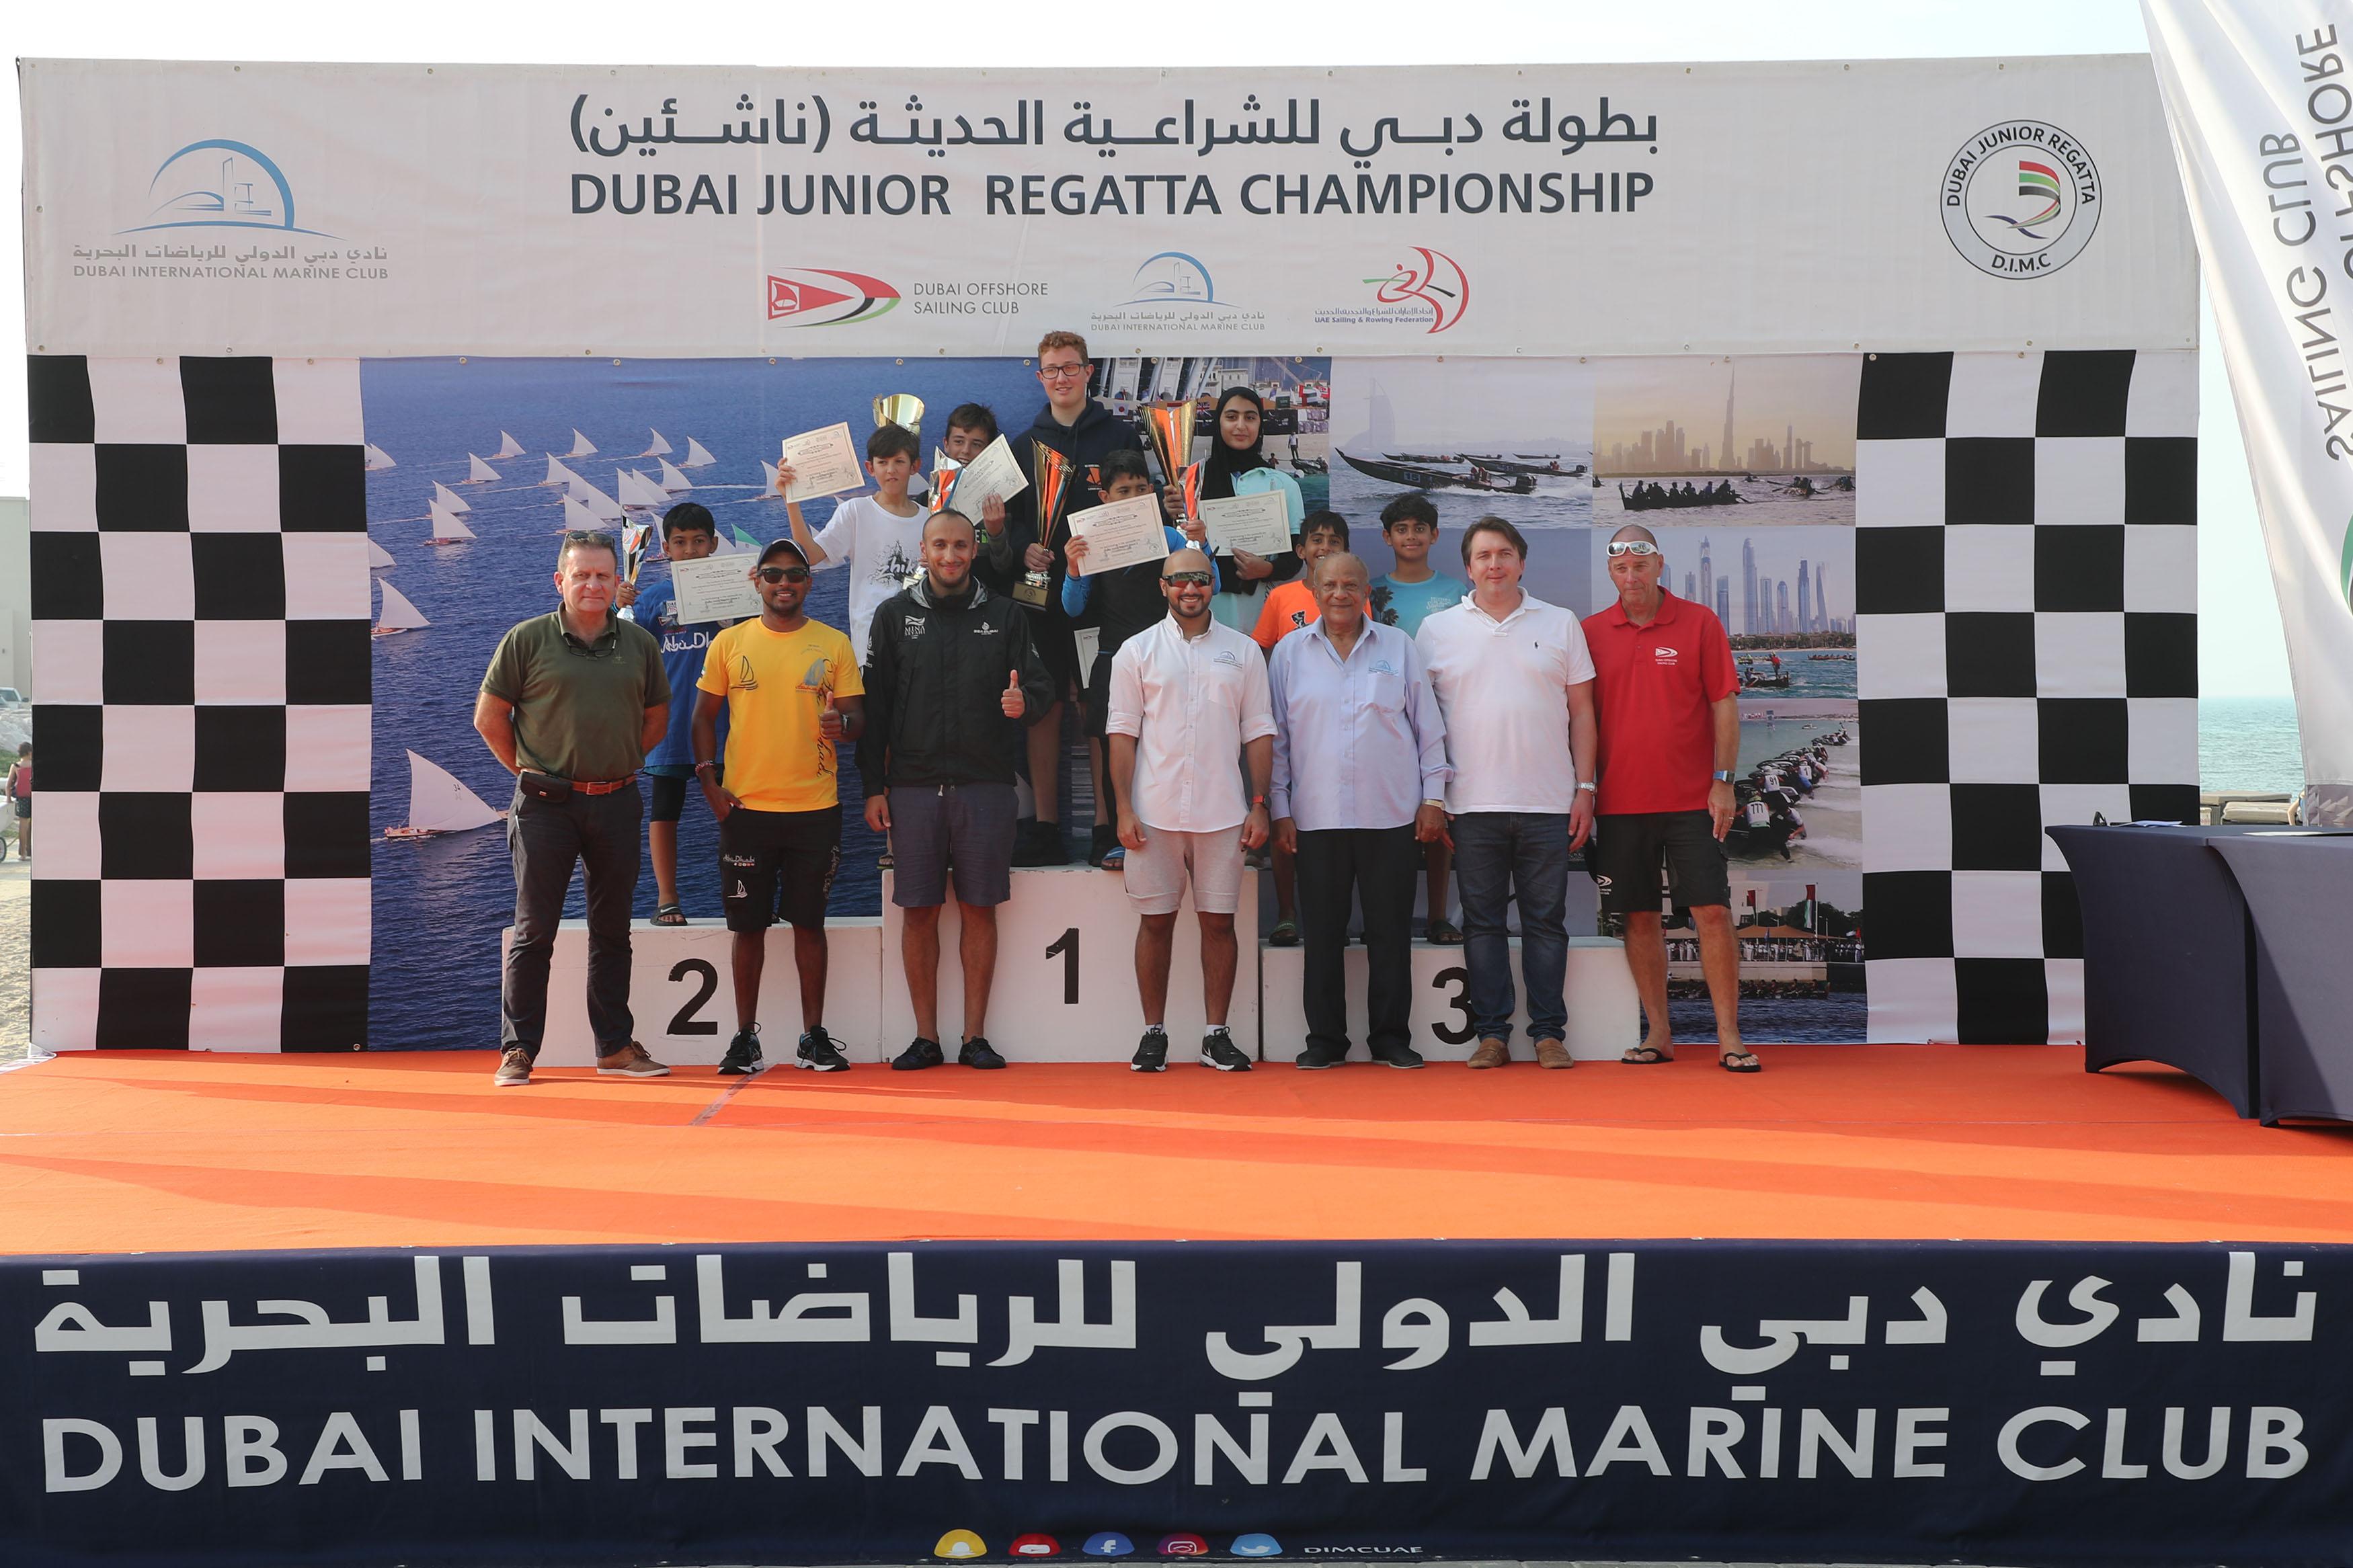 The Conclusion of Dubai Junior Regatta Second Round